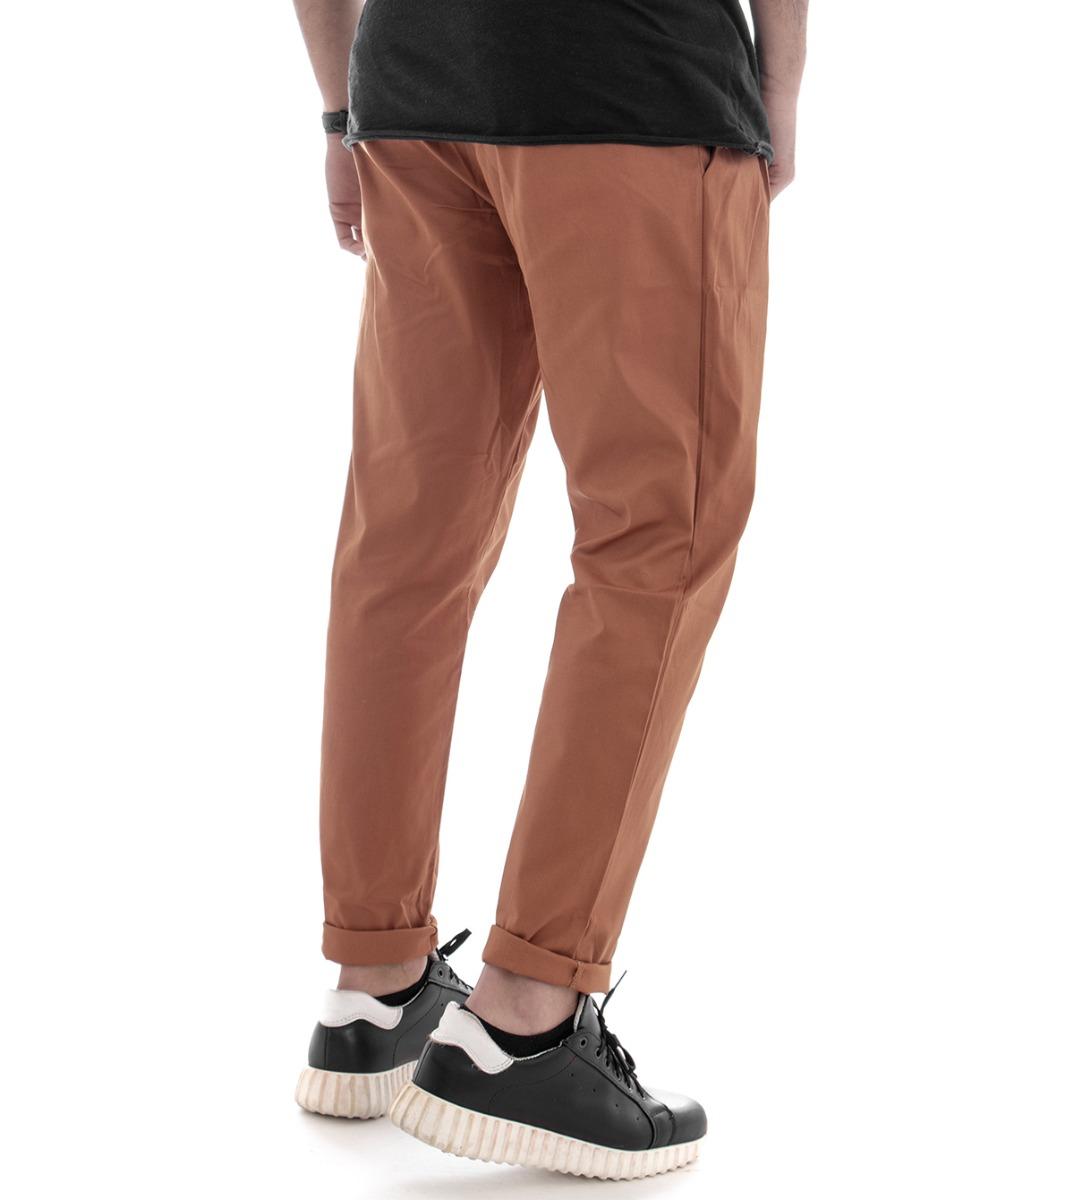 Pantalone-Uomo-Tasca-America-Mattone-Cavallo-Basso-Casual-Pence-GIOSAL miniatura 7